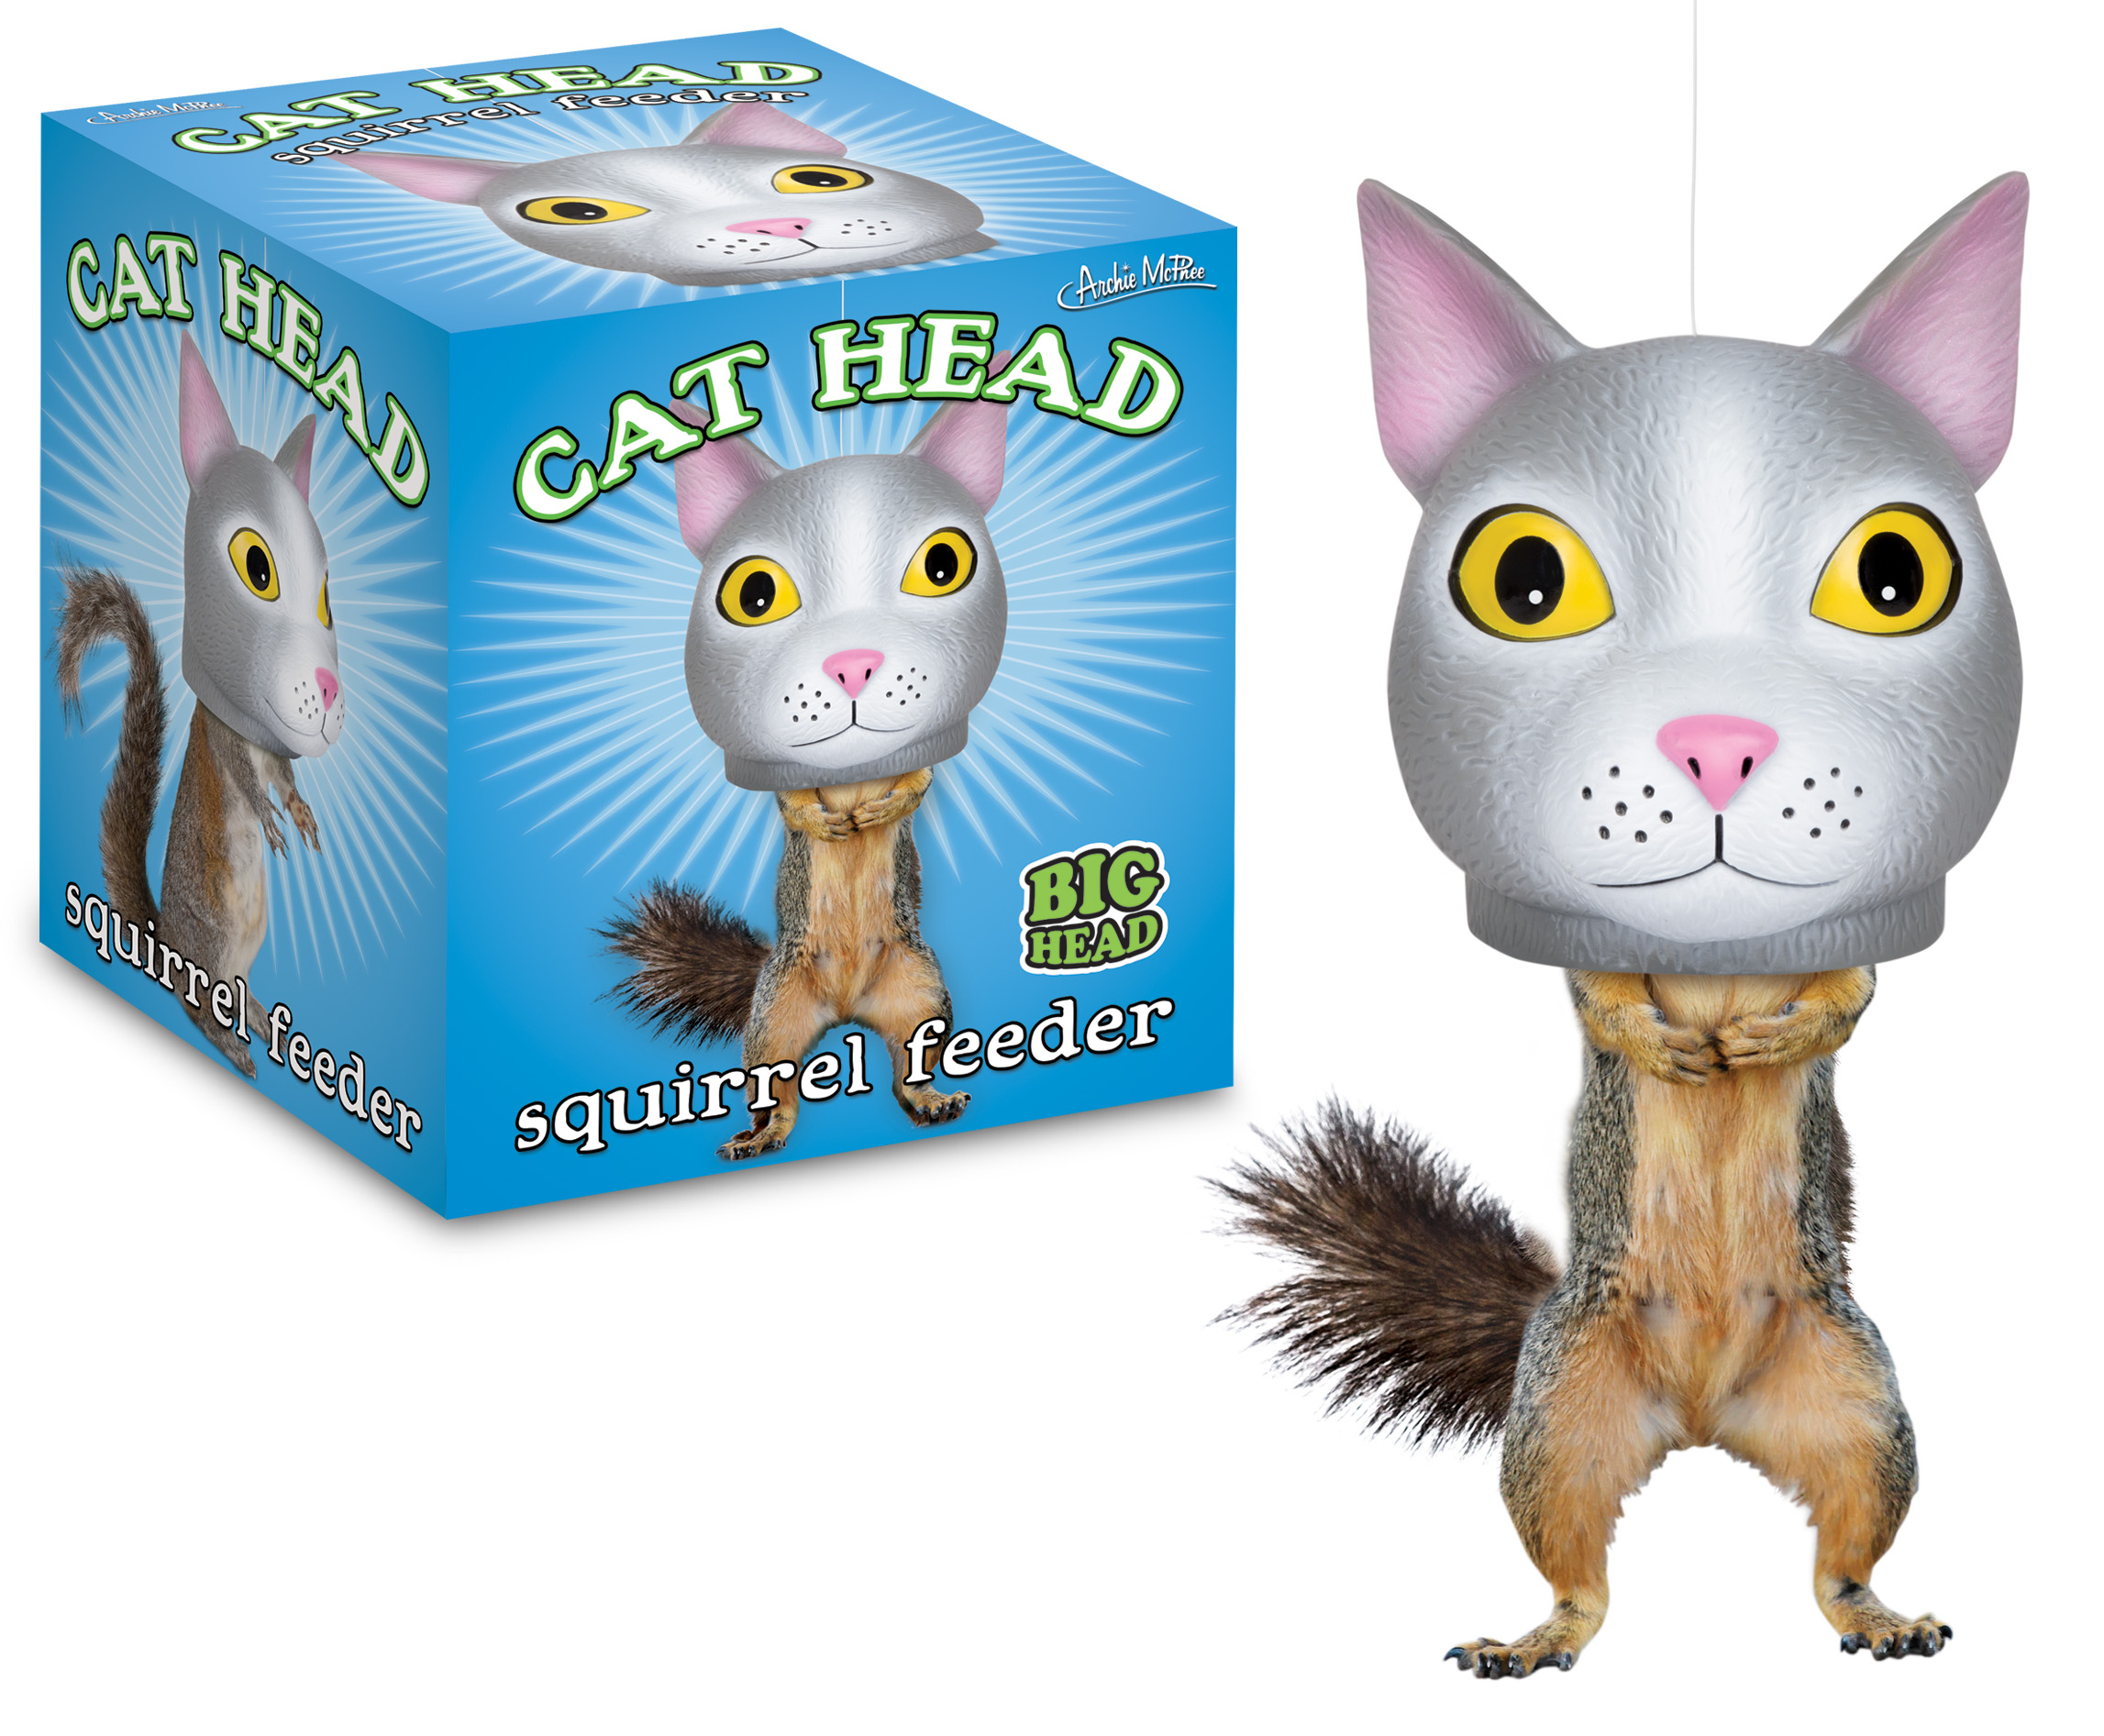 Squirrel Feeder Cat Head Incognito